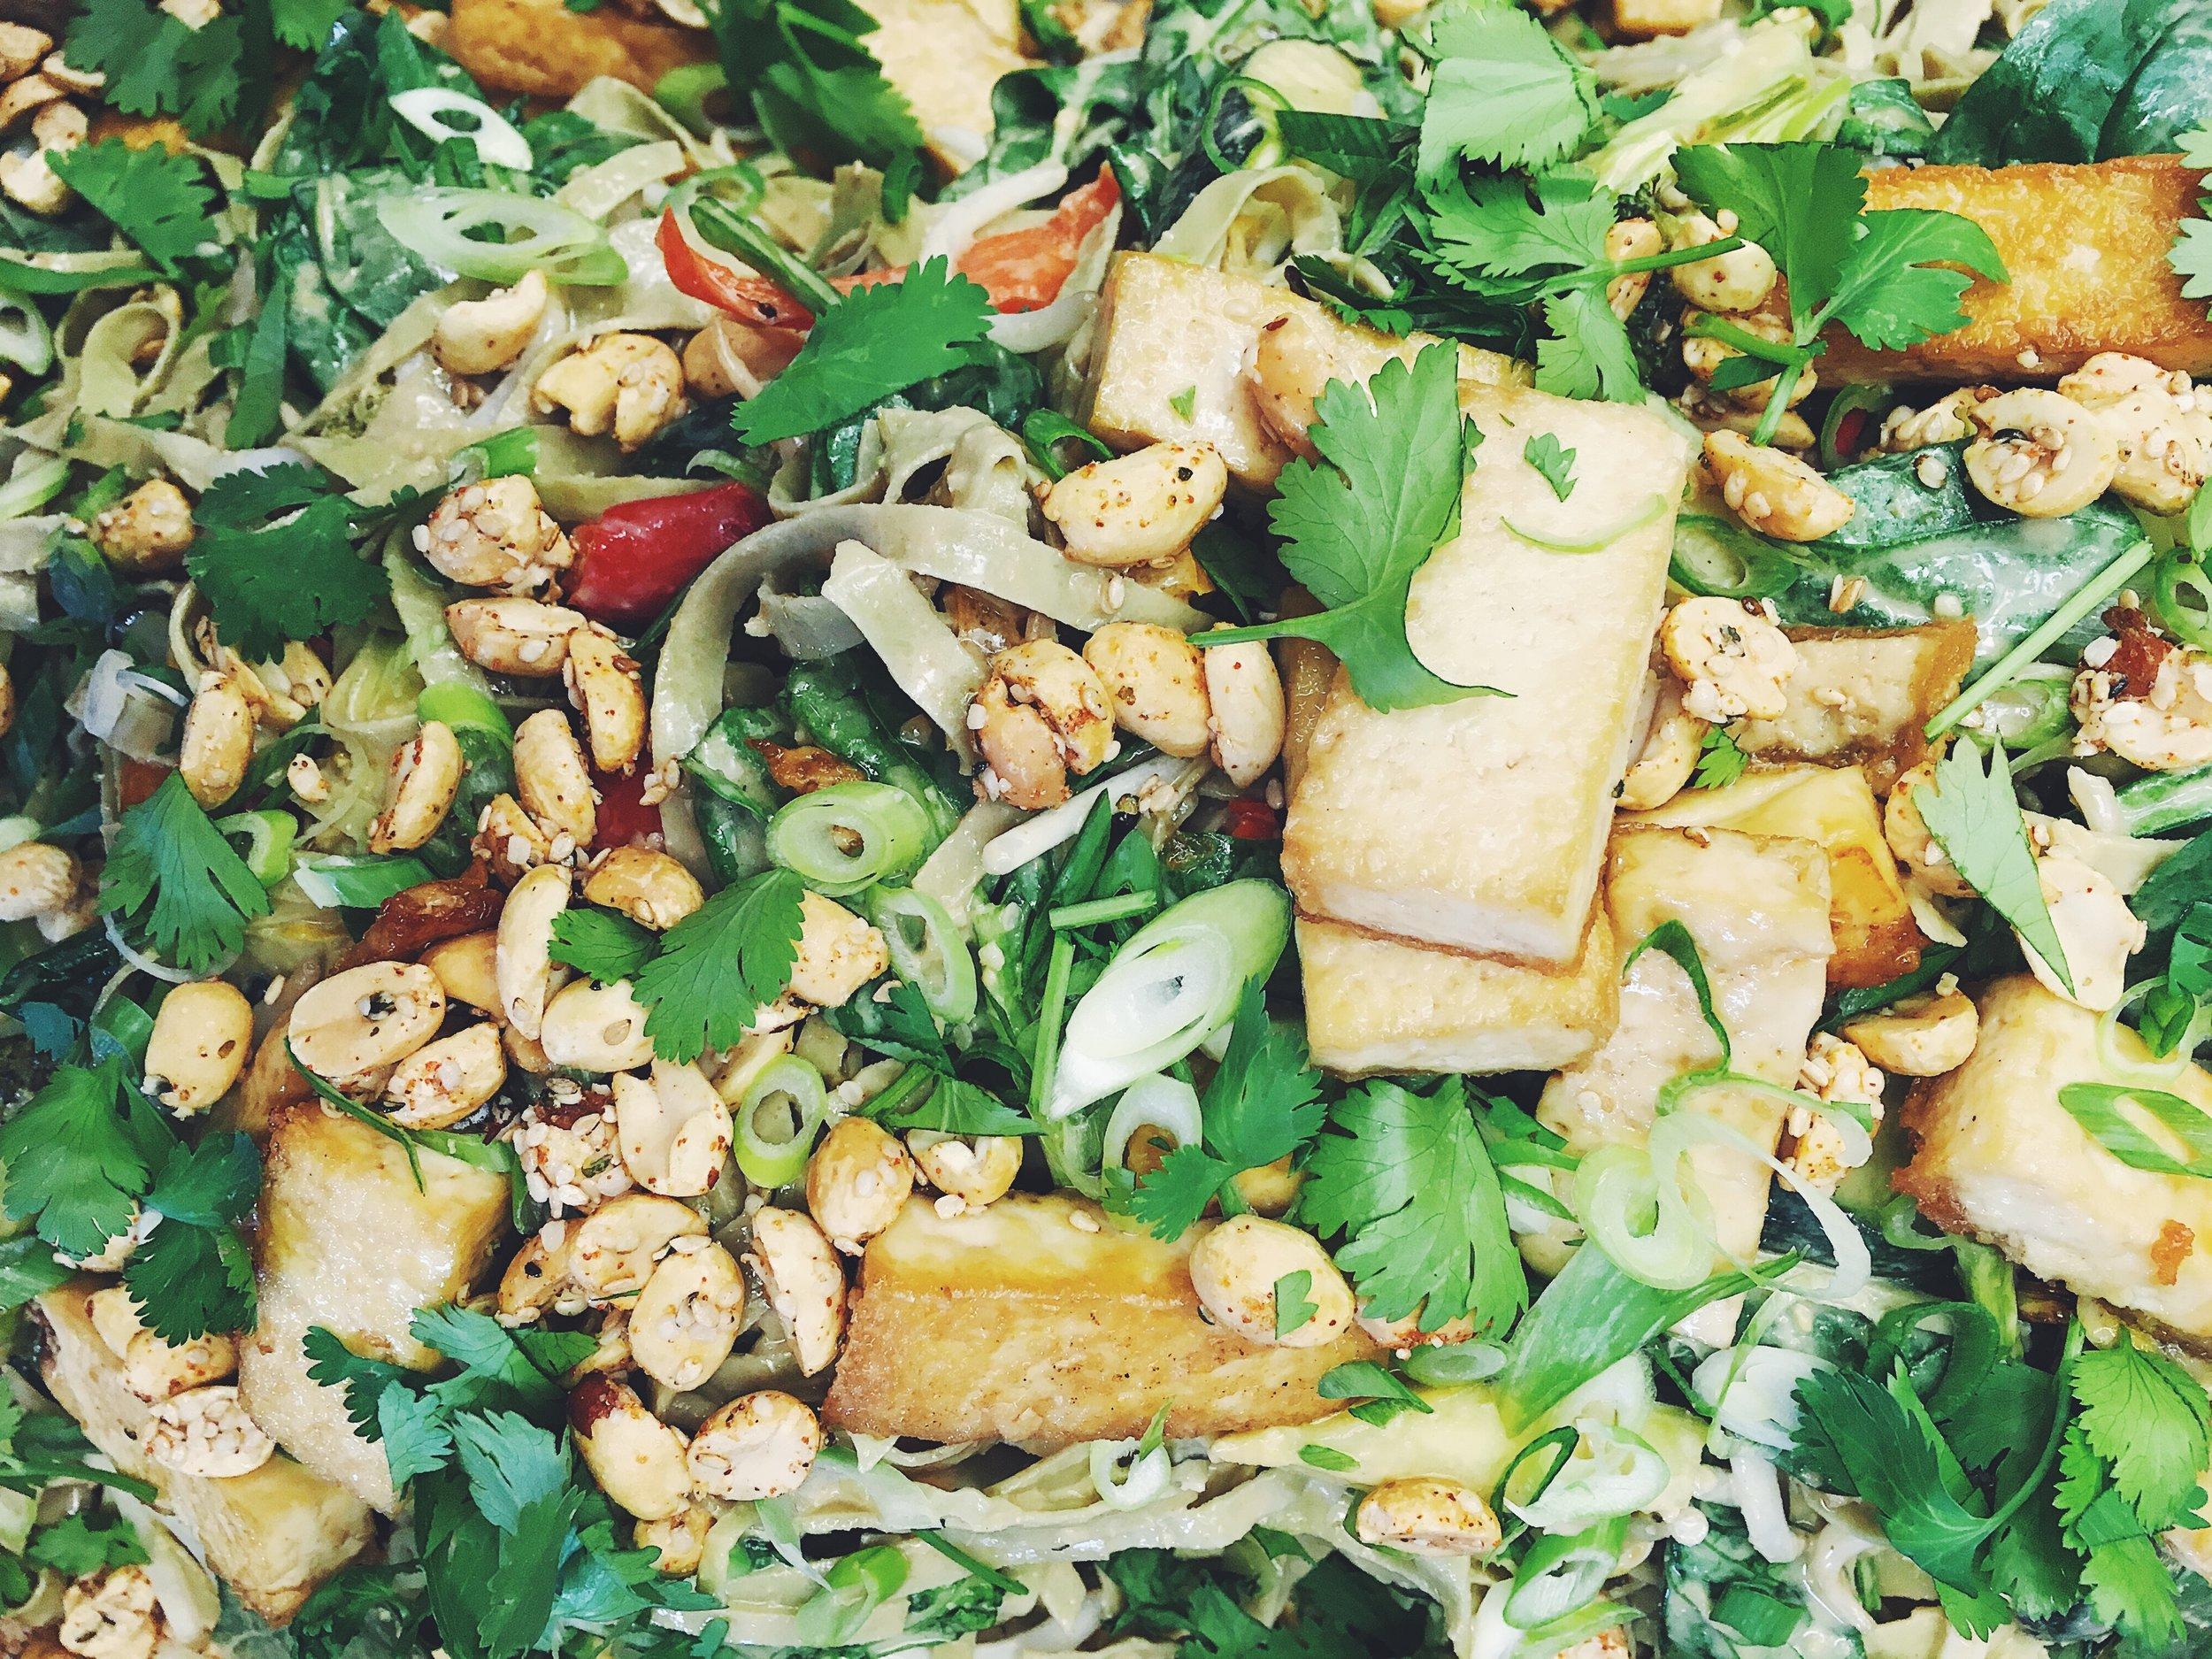 Edamame Mung Bean Noodle Stir-fry with Ginger Almond Sauce + Garlic Tofu